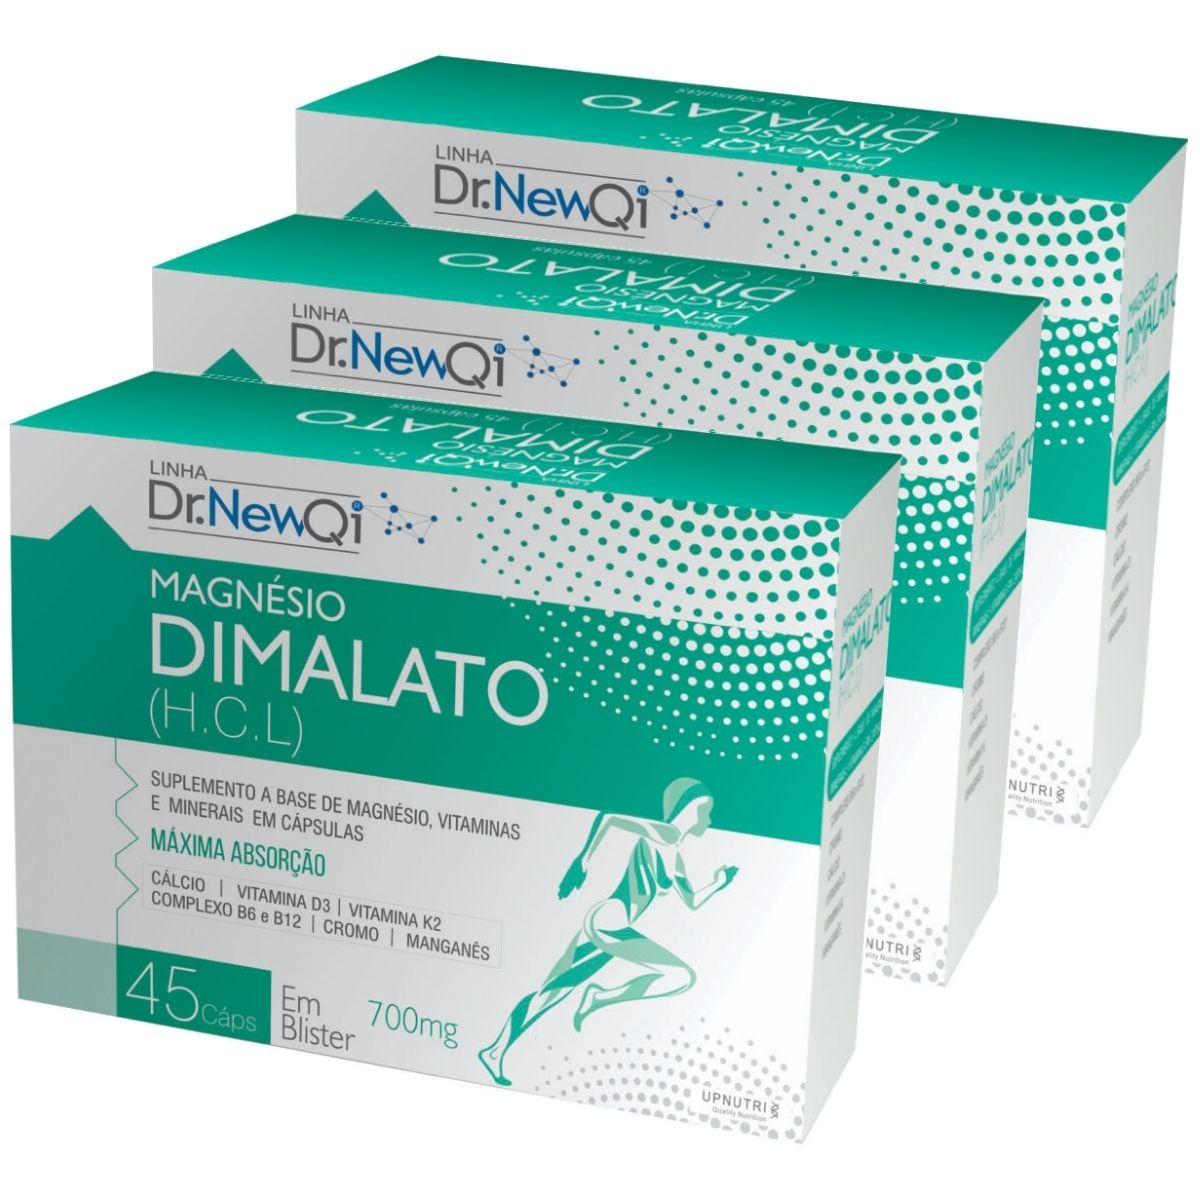 3x Magnésio Dimalato HCL 45 Cápsulas 700mg Dr. New Qi - Upnutri